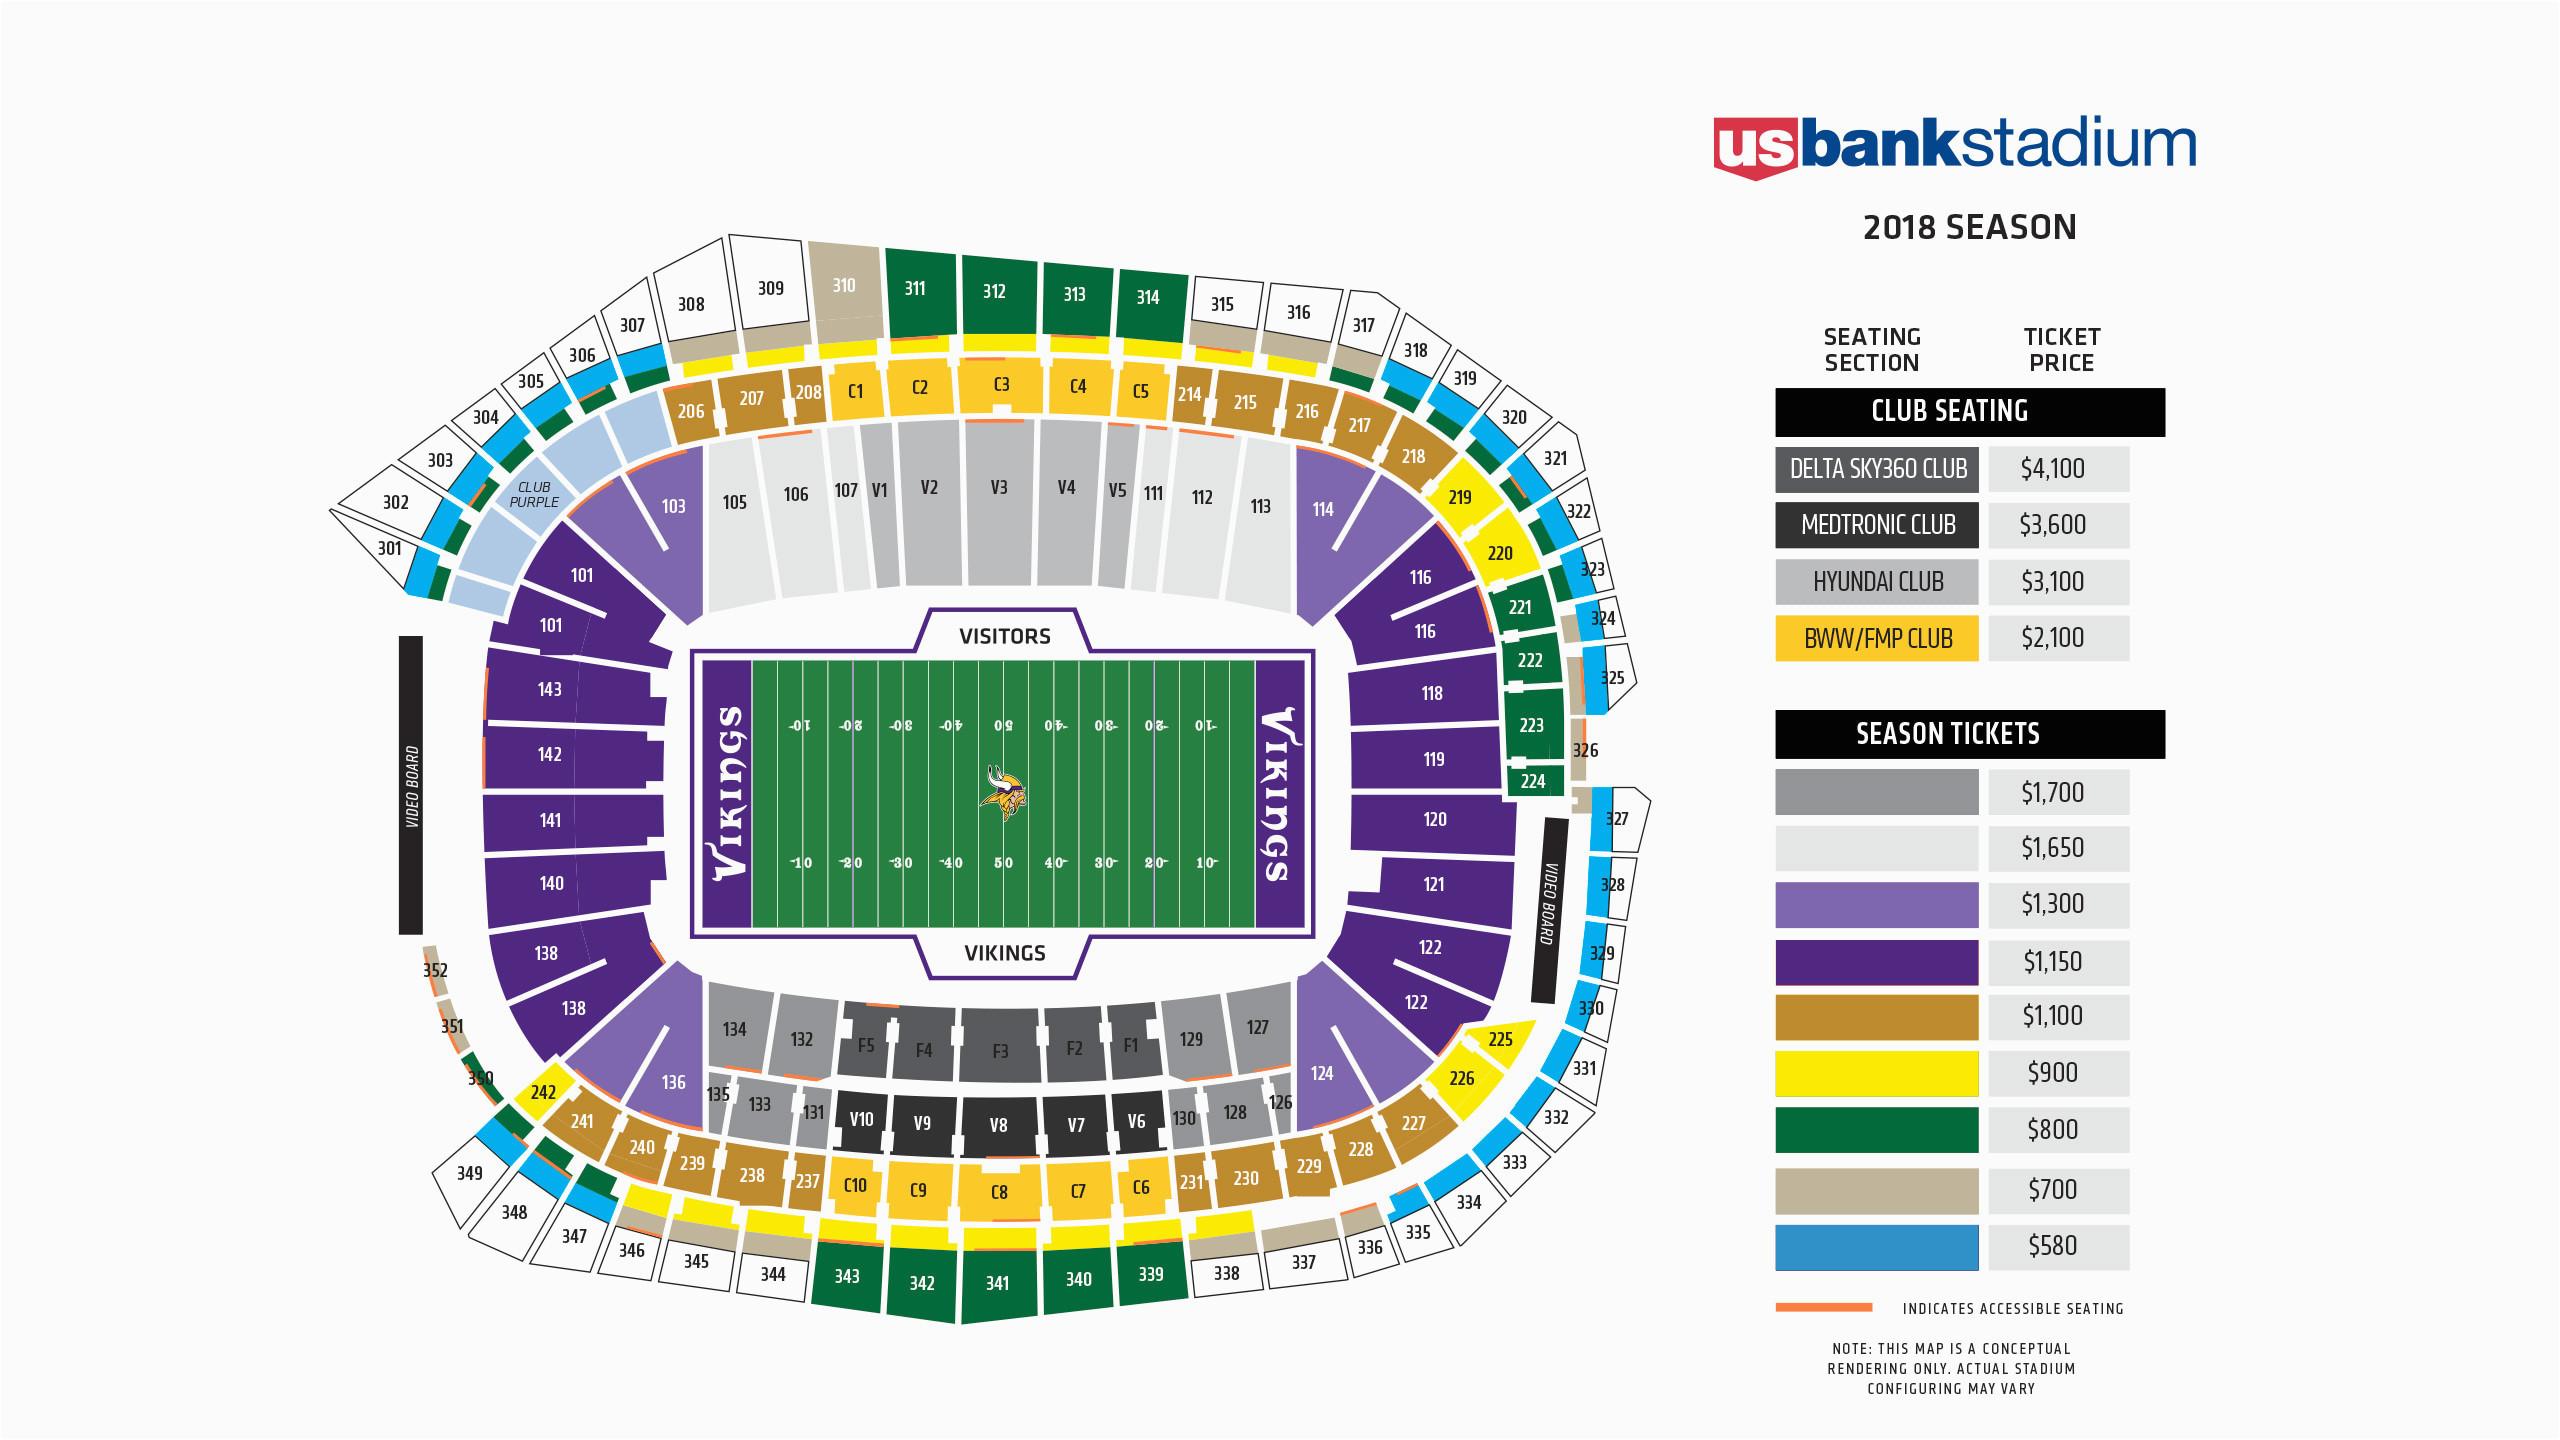 Map Of Georgia Dome Seating Vikings Seating Chart at U S Bank Stadium Minnesota Vikings